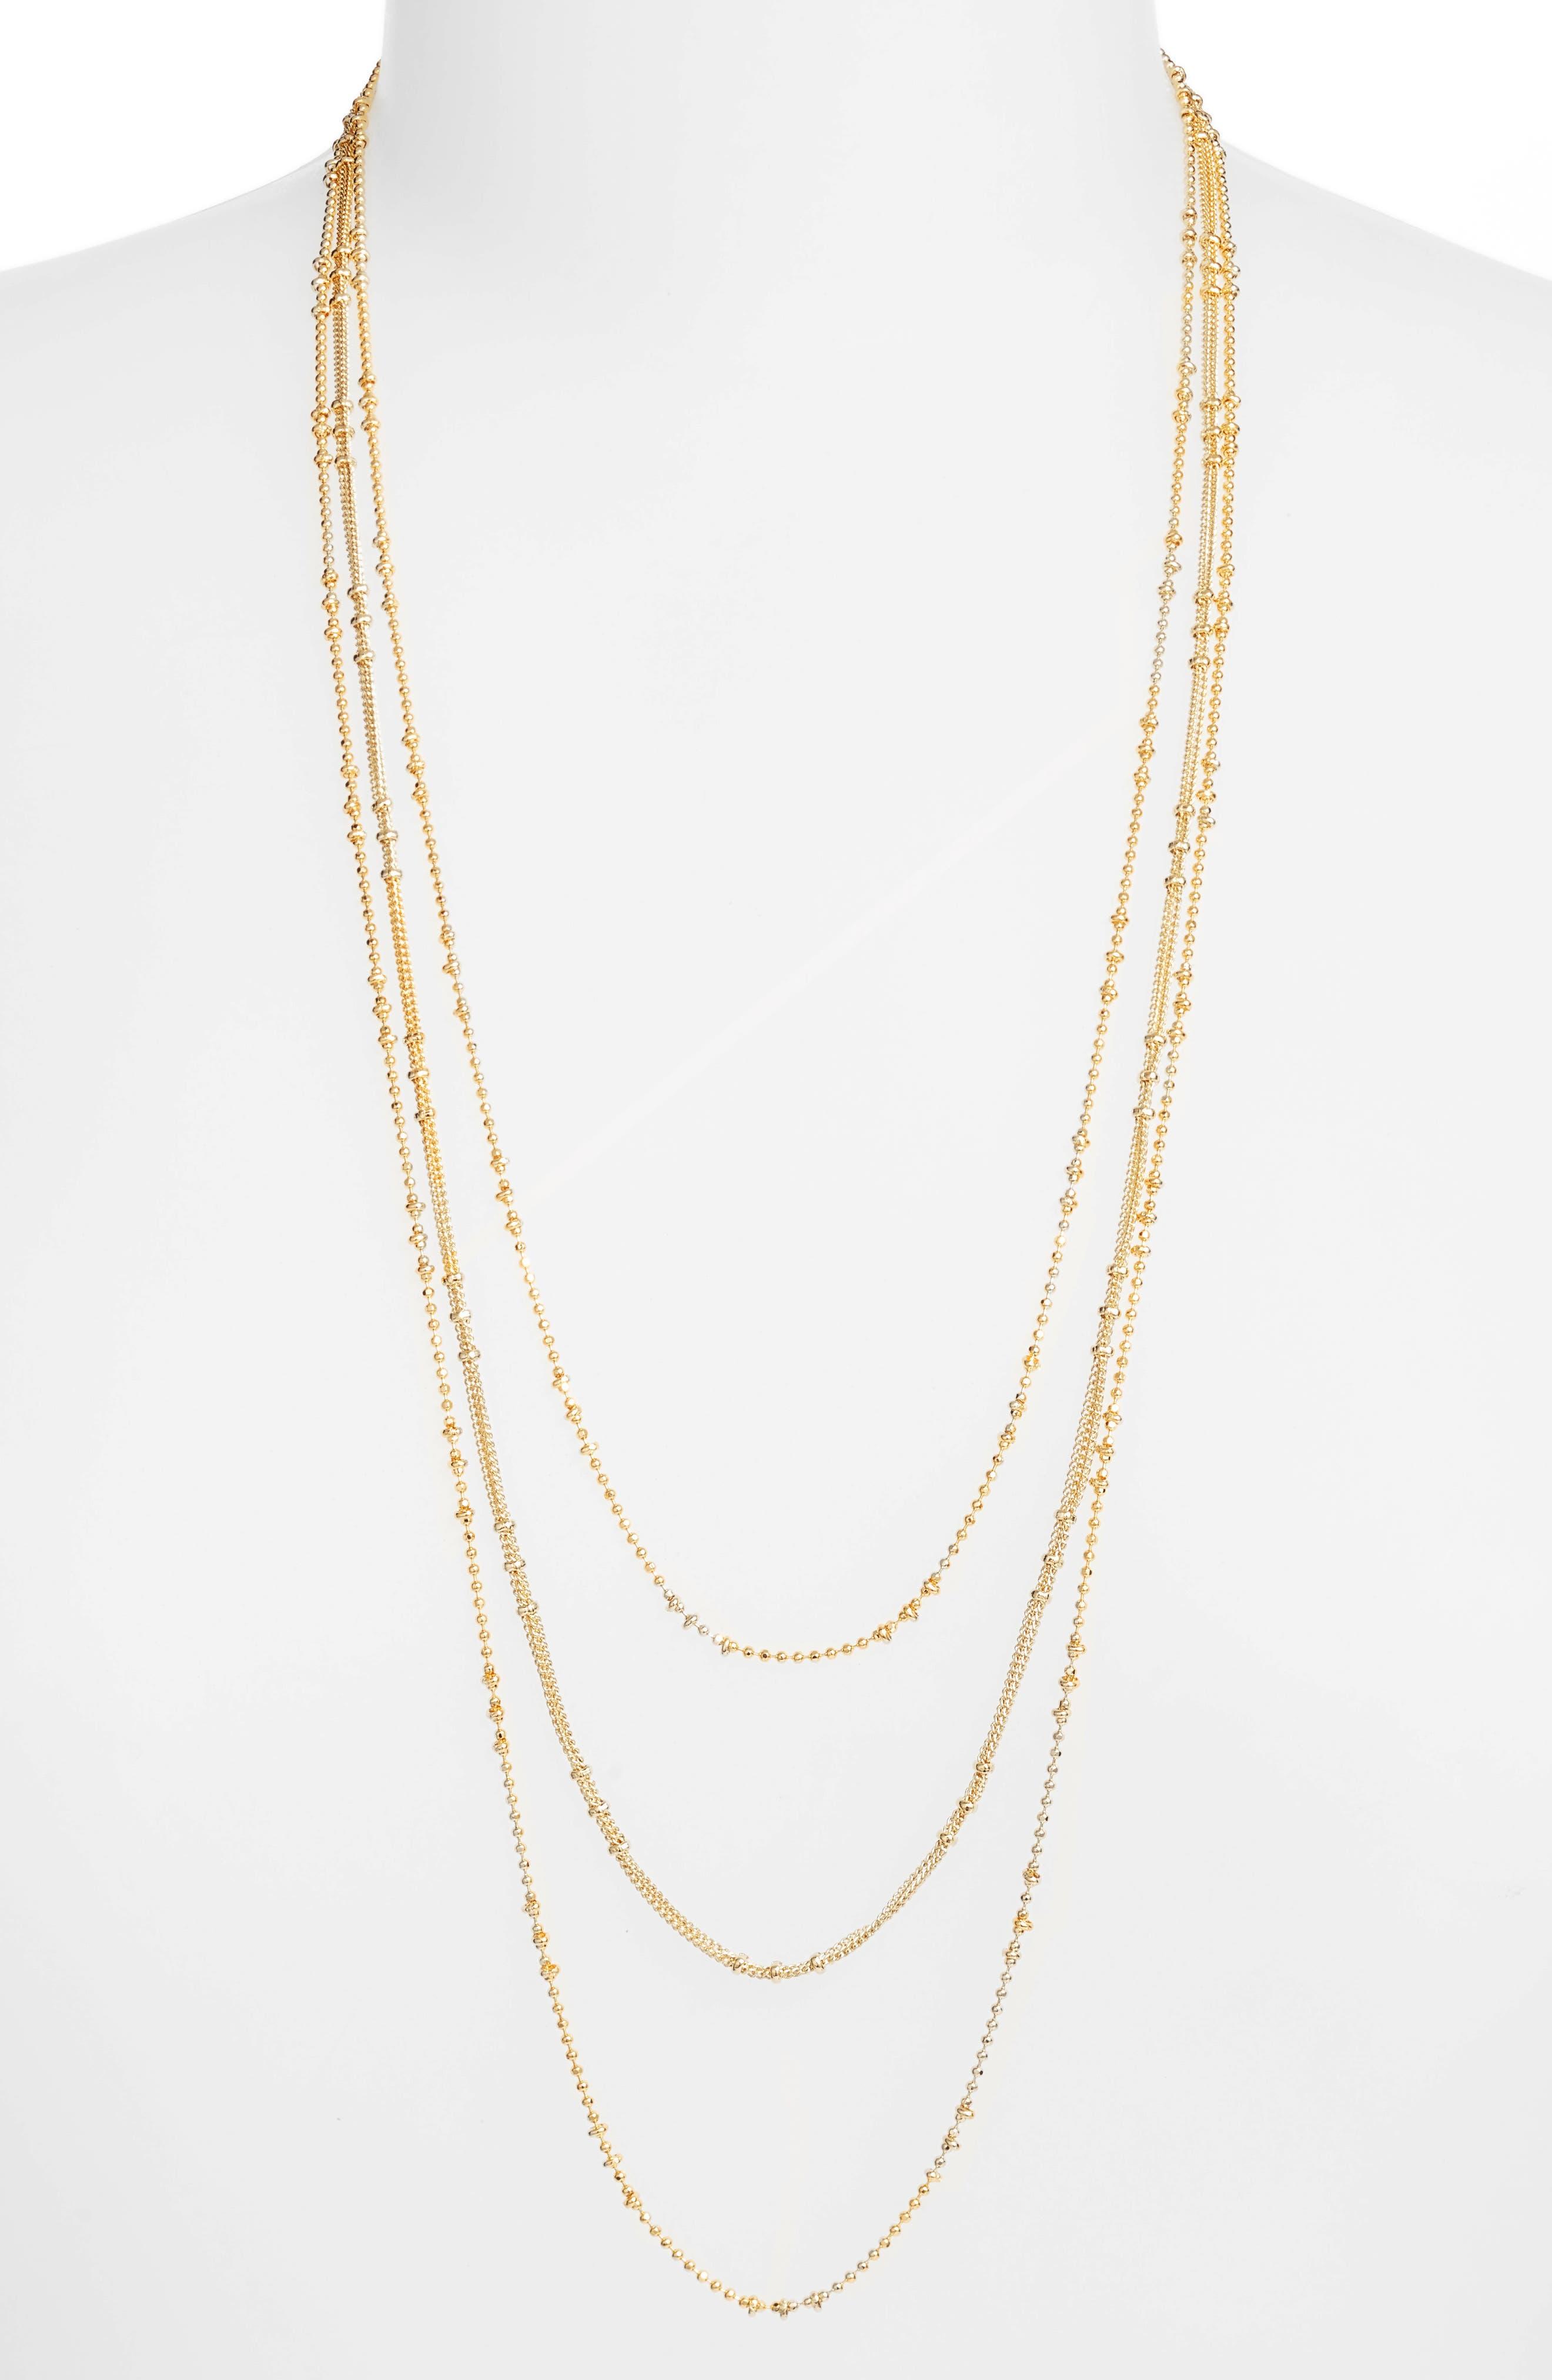 Margo 18 K Layered Chain Necklace by Gorjana